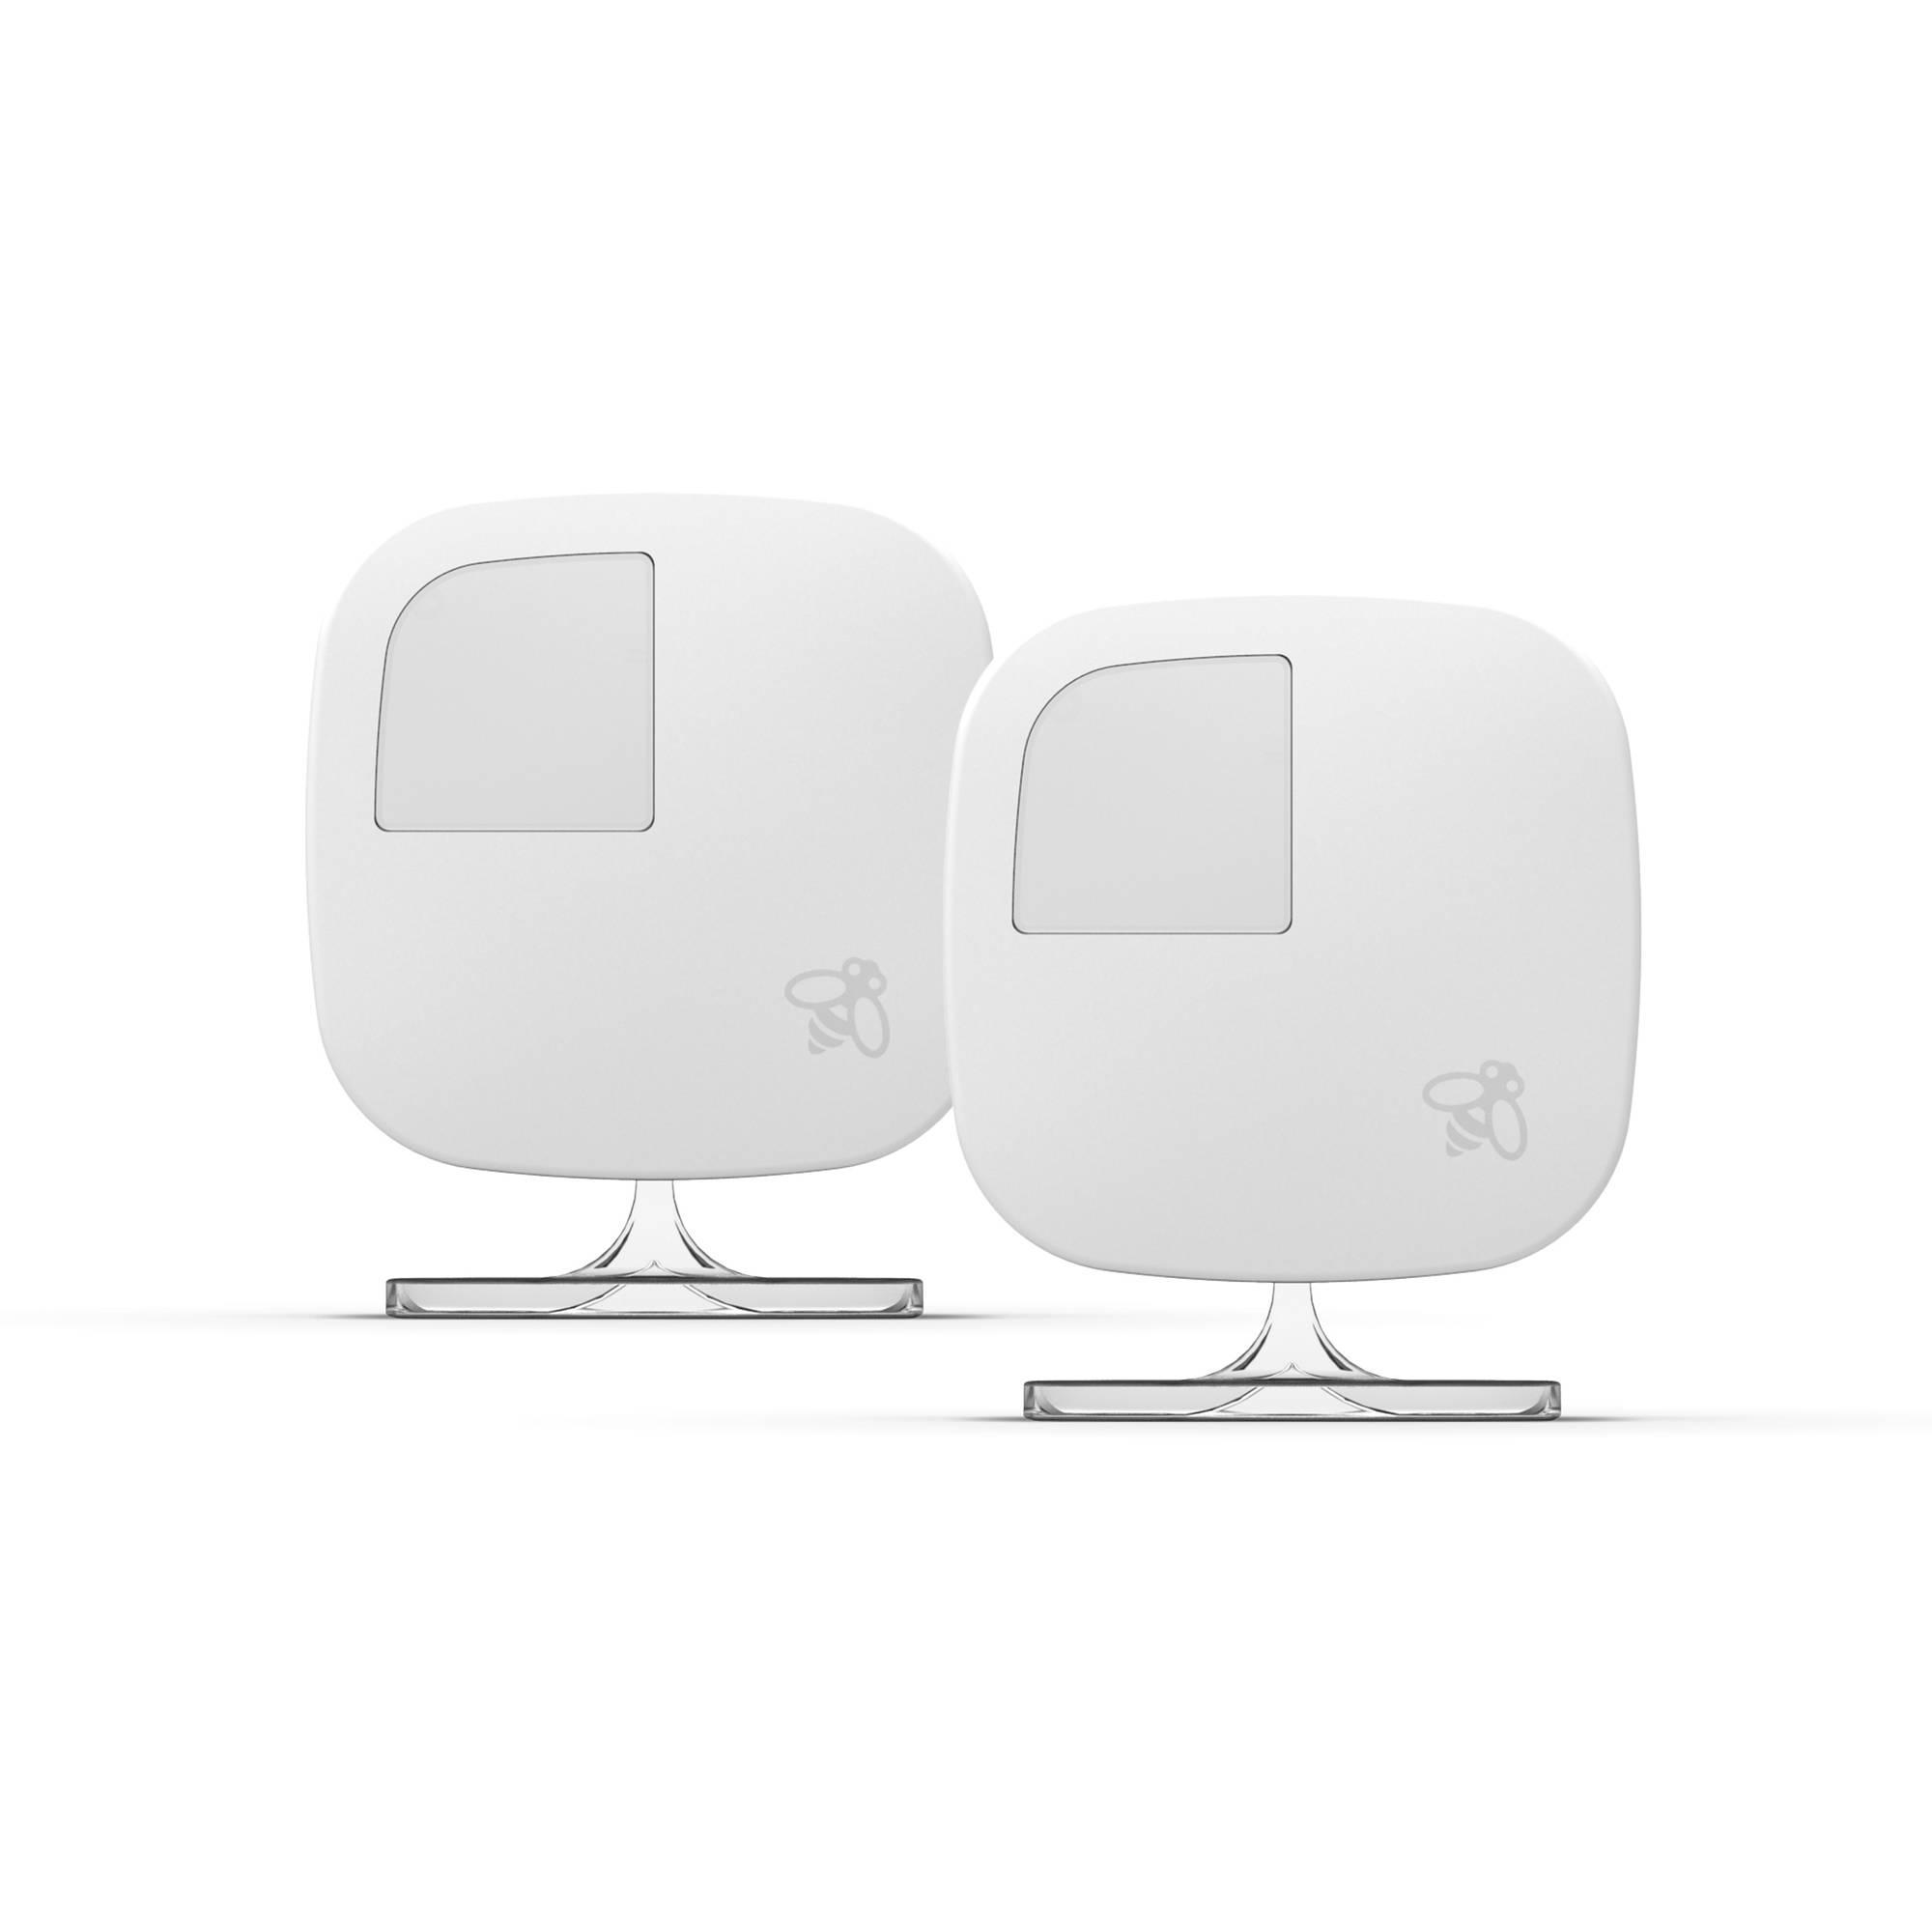 ecobee3 Remote Sensor Pack